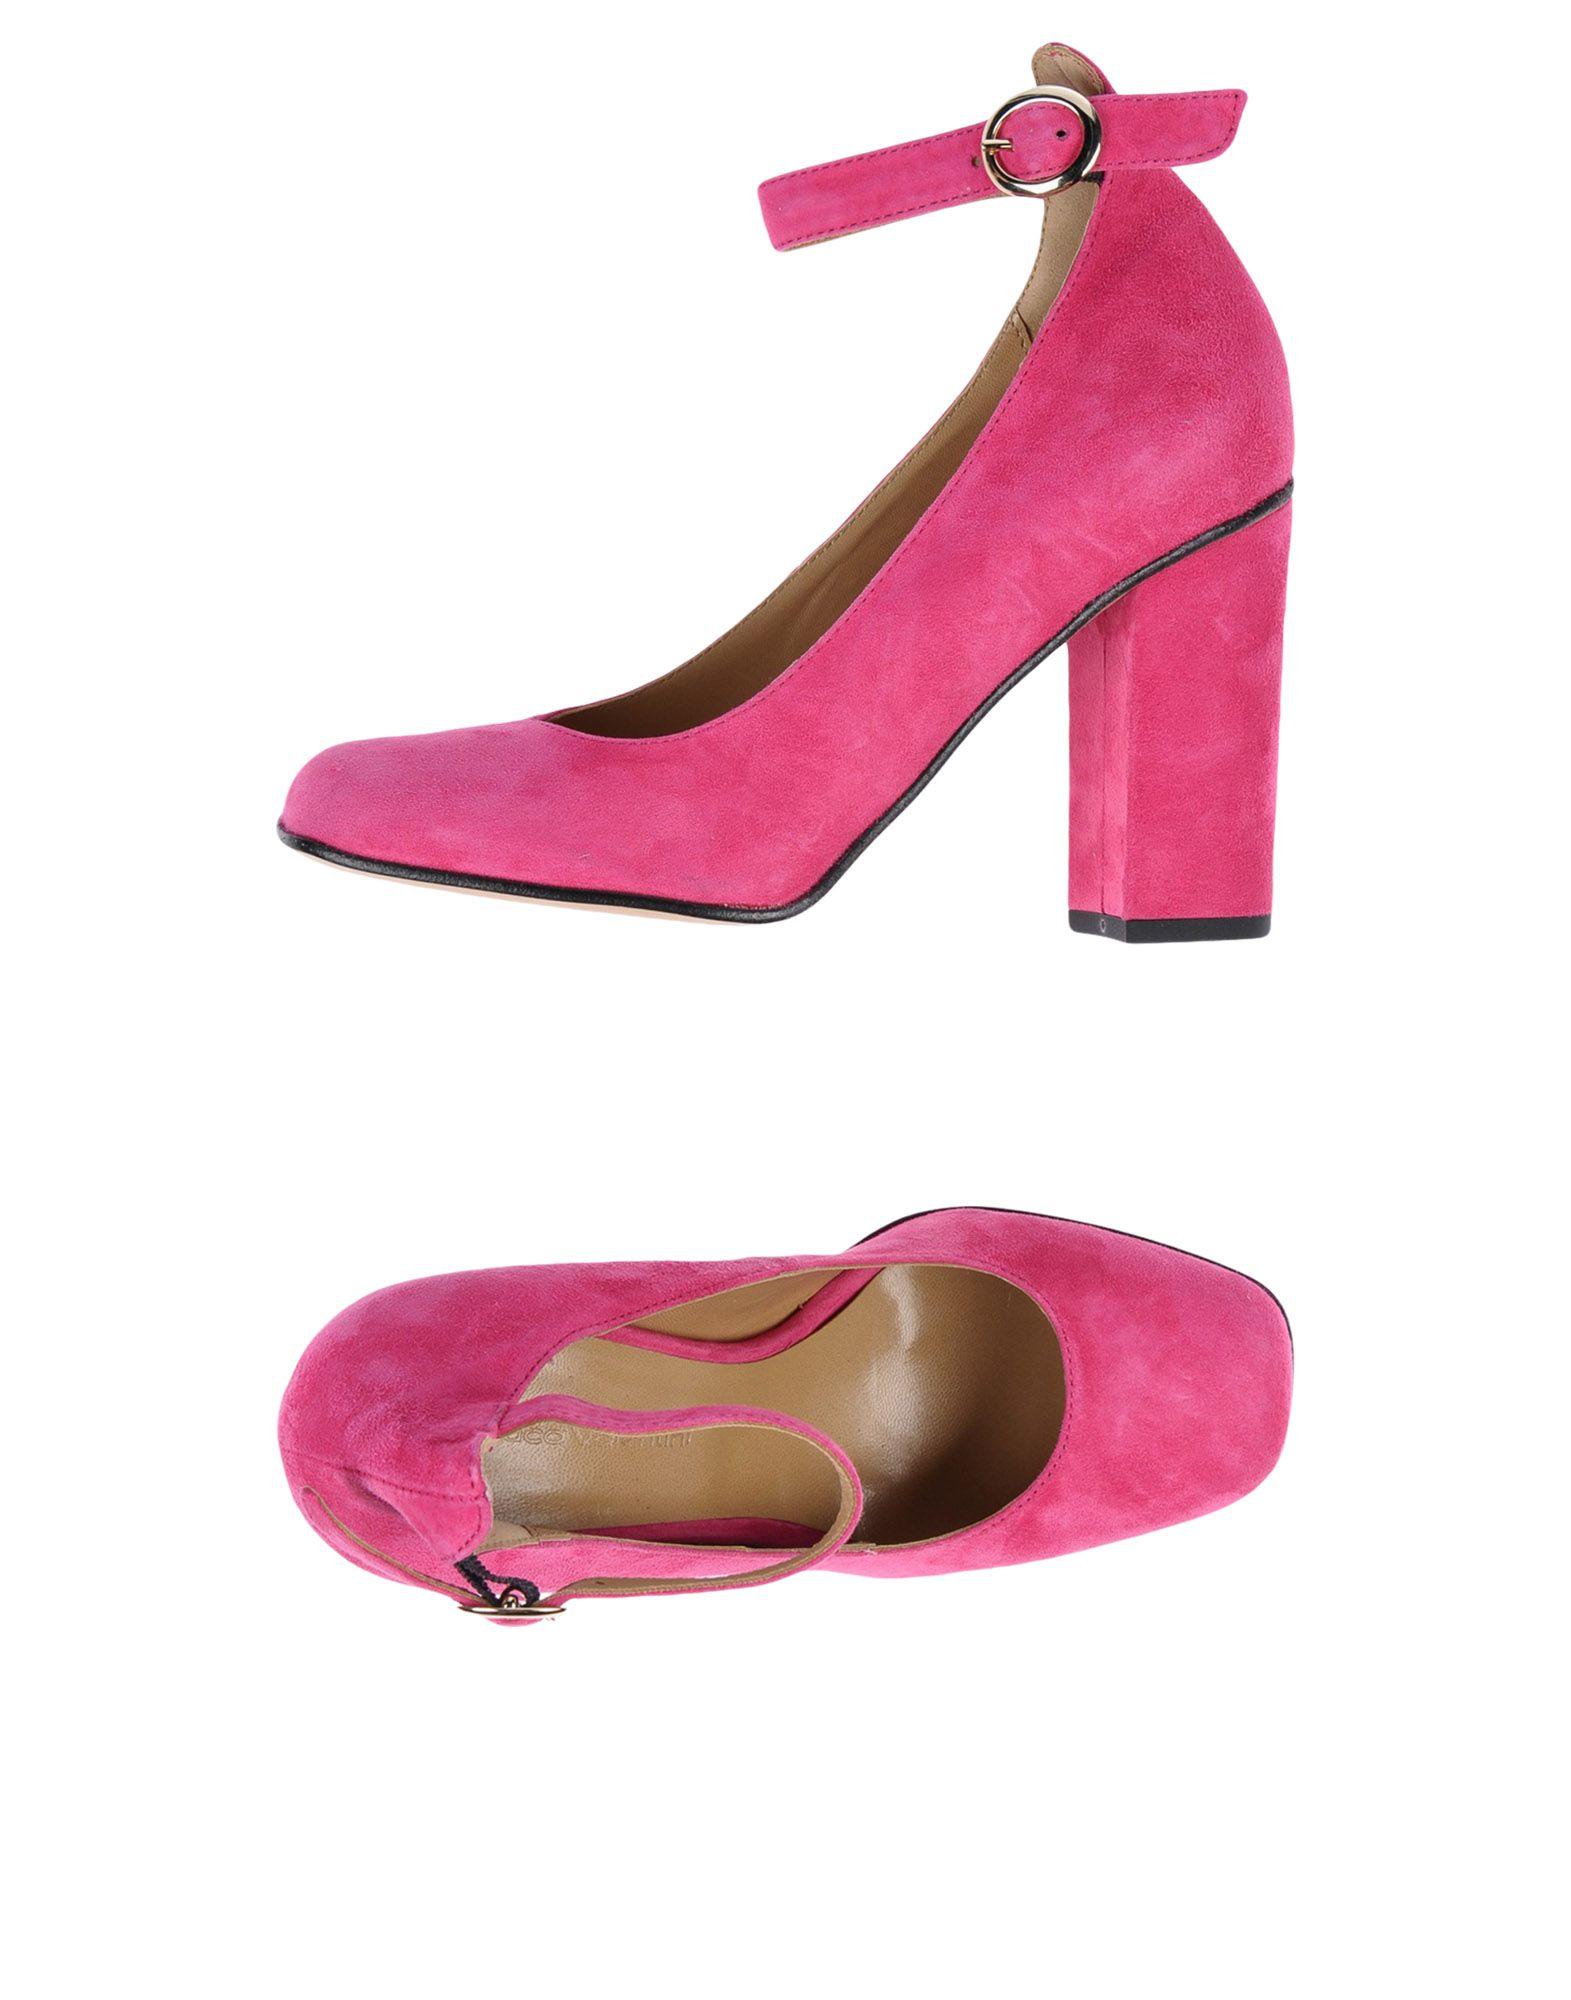 Luca Valentini Pumps Damen Gute  11294978IC Gute Damen Qualität beliebte Schuhe 89a1ee